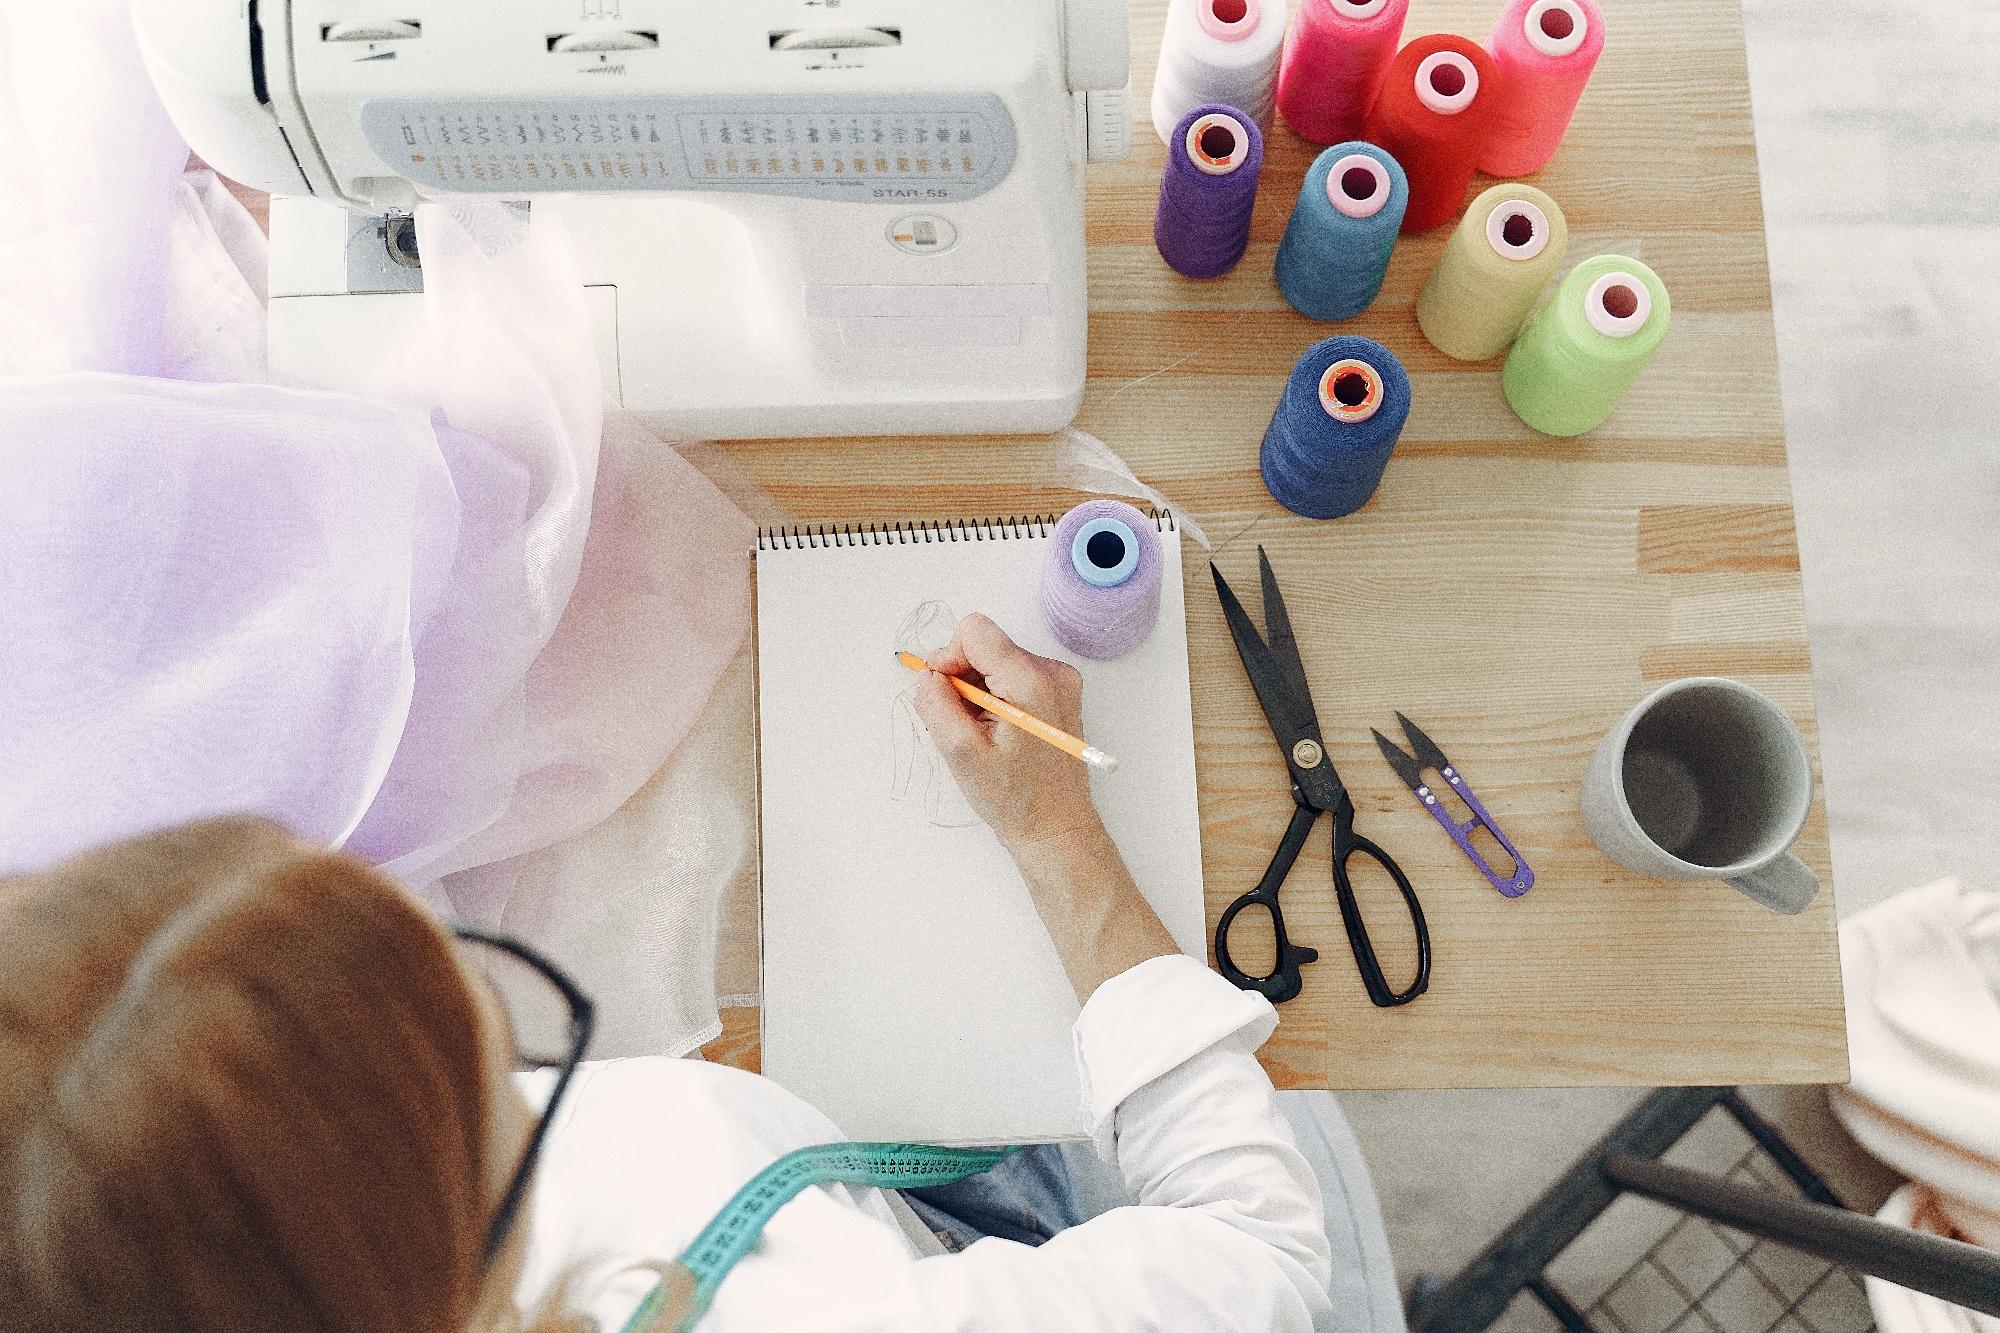 woman-in-white-long-sleeve-shirt-sketching-on-white-printer-3984842-1